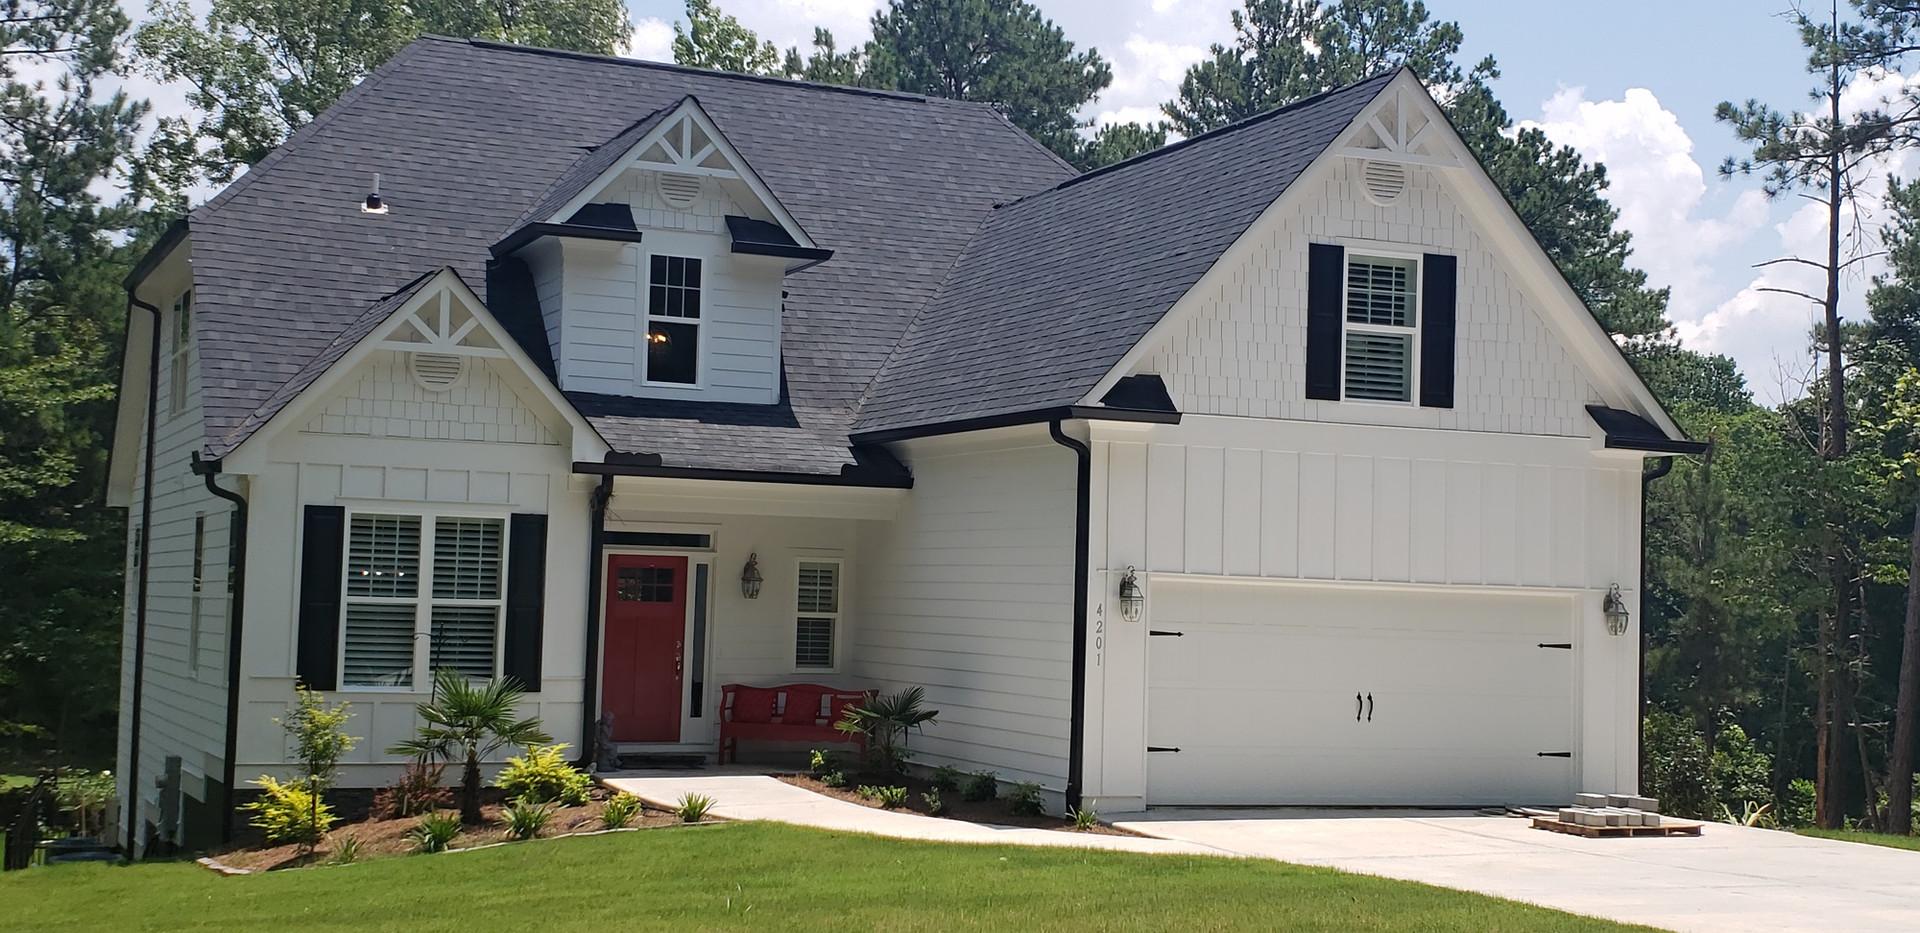 Home in Fairfield